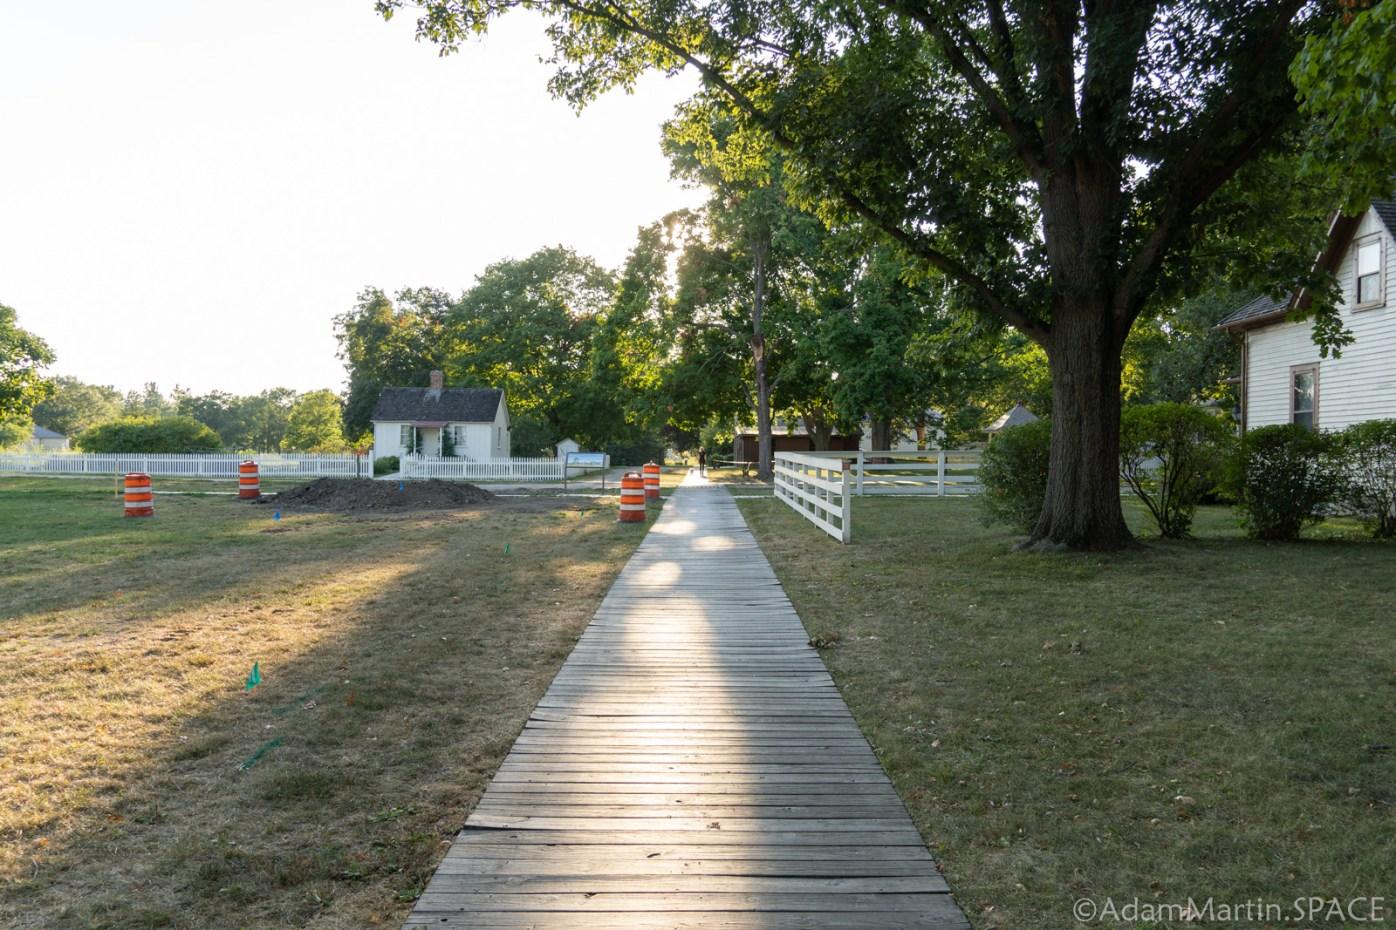 Herbert Hoover National Historic Site - Boardwalk Path